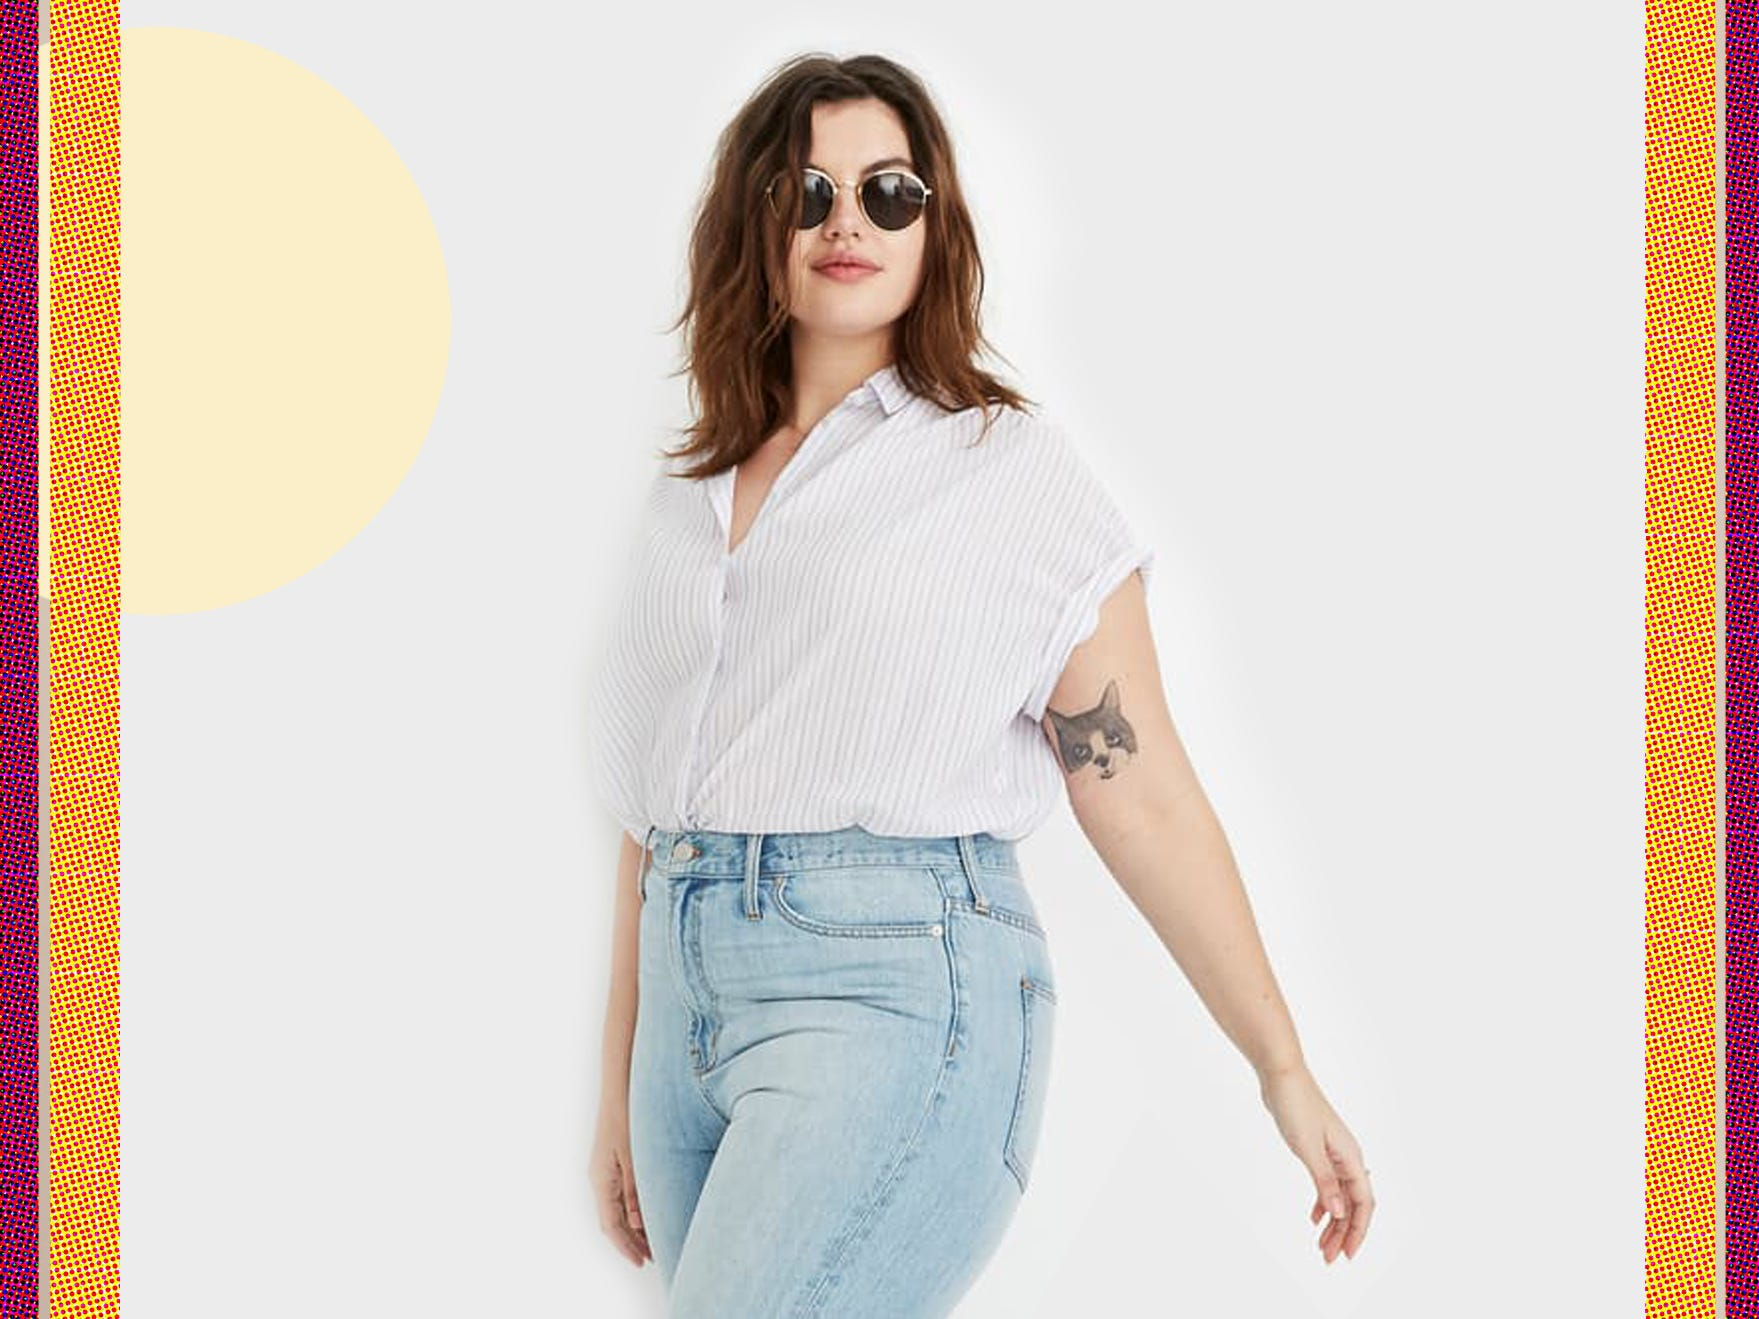 659e7fd8d5031 Trendy Maternity Clothes 2019 New Luxury Fashion Line